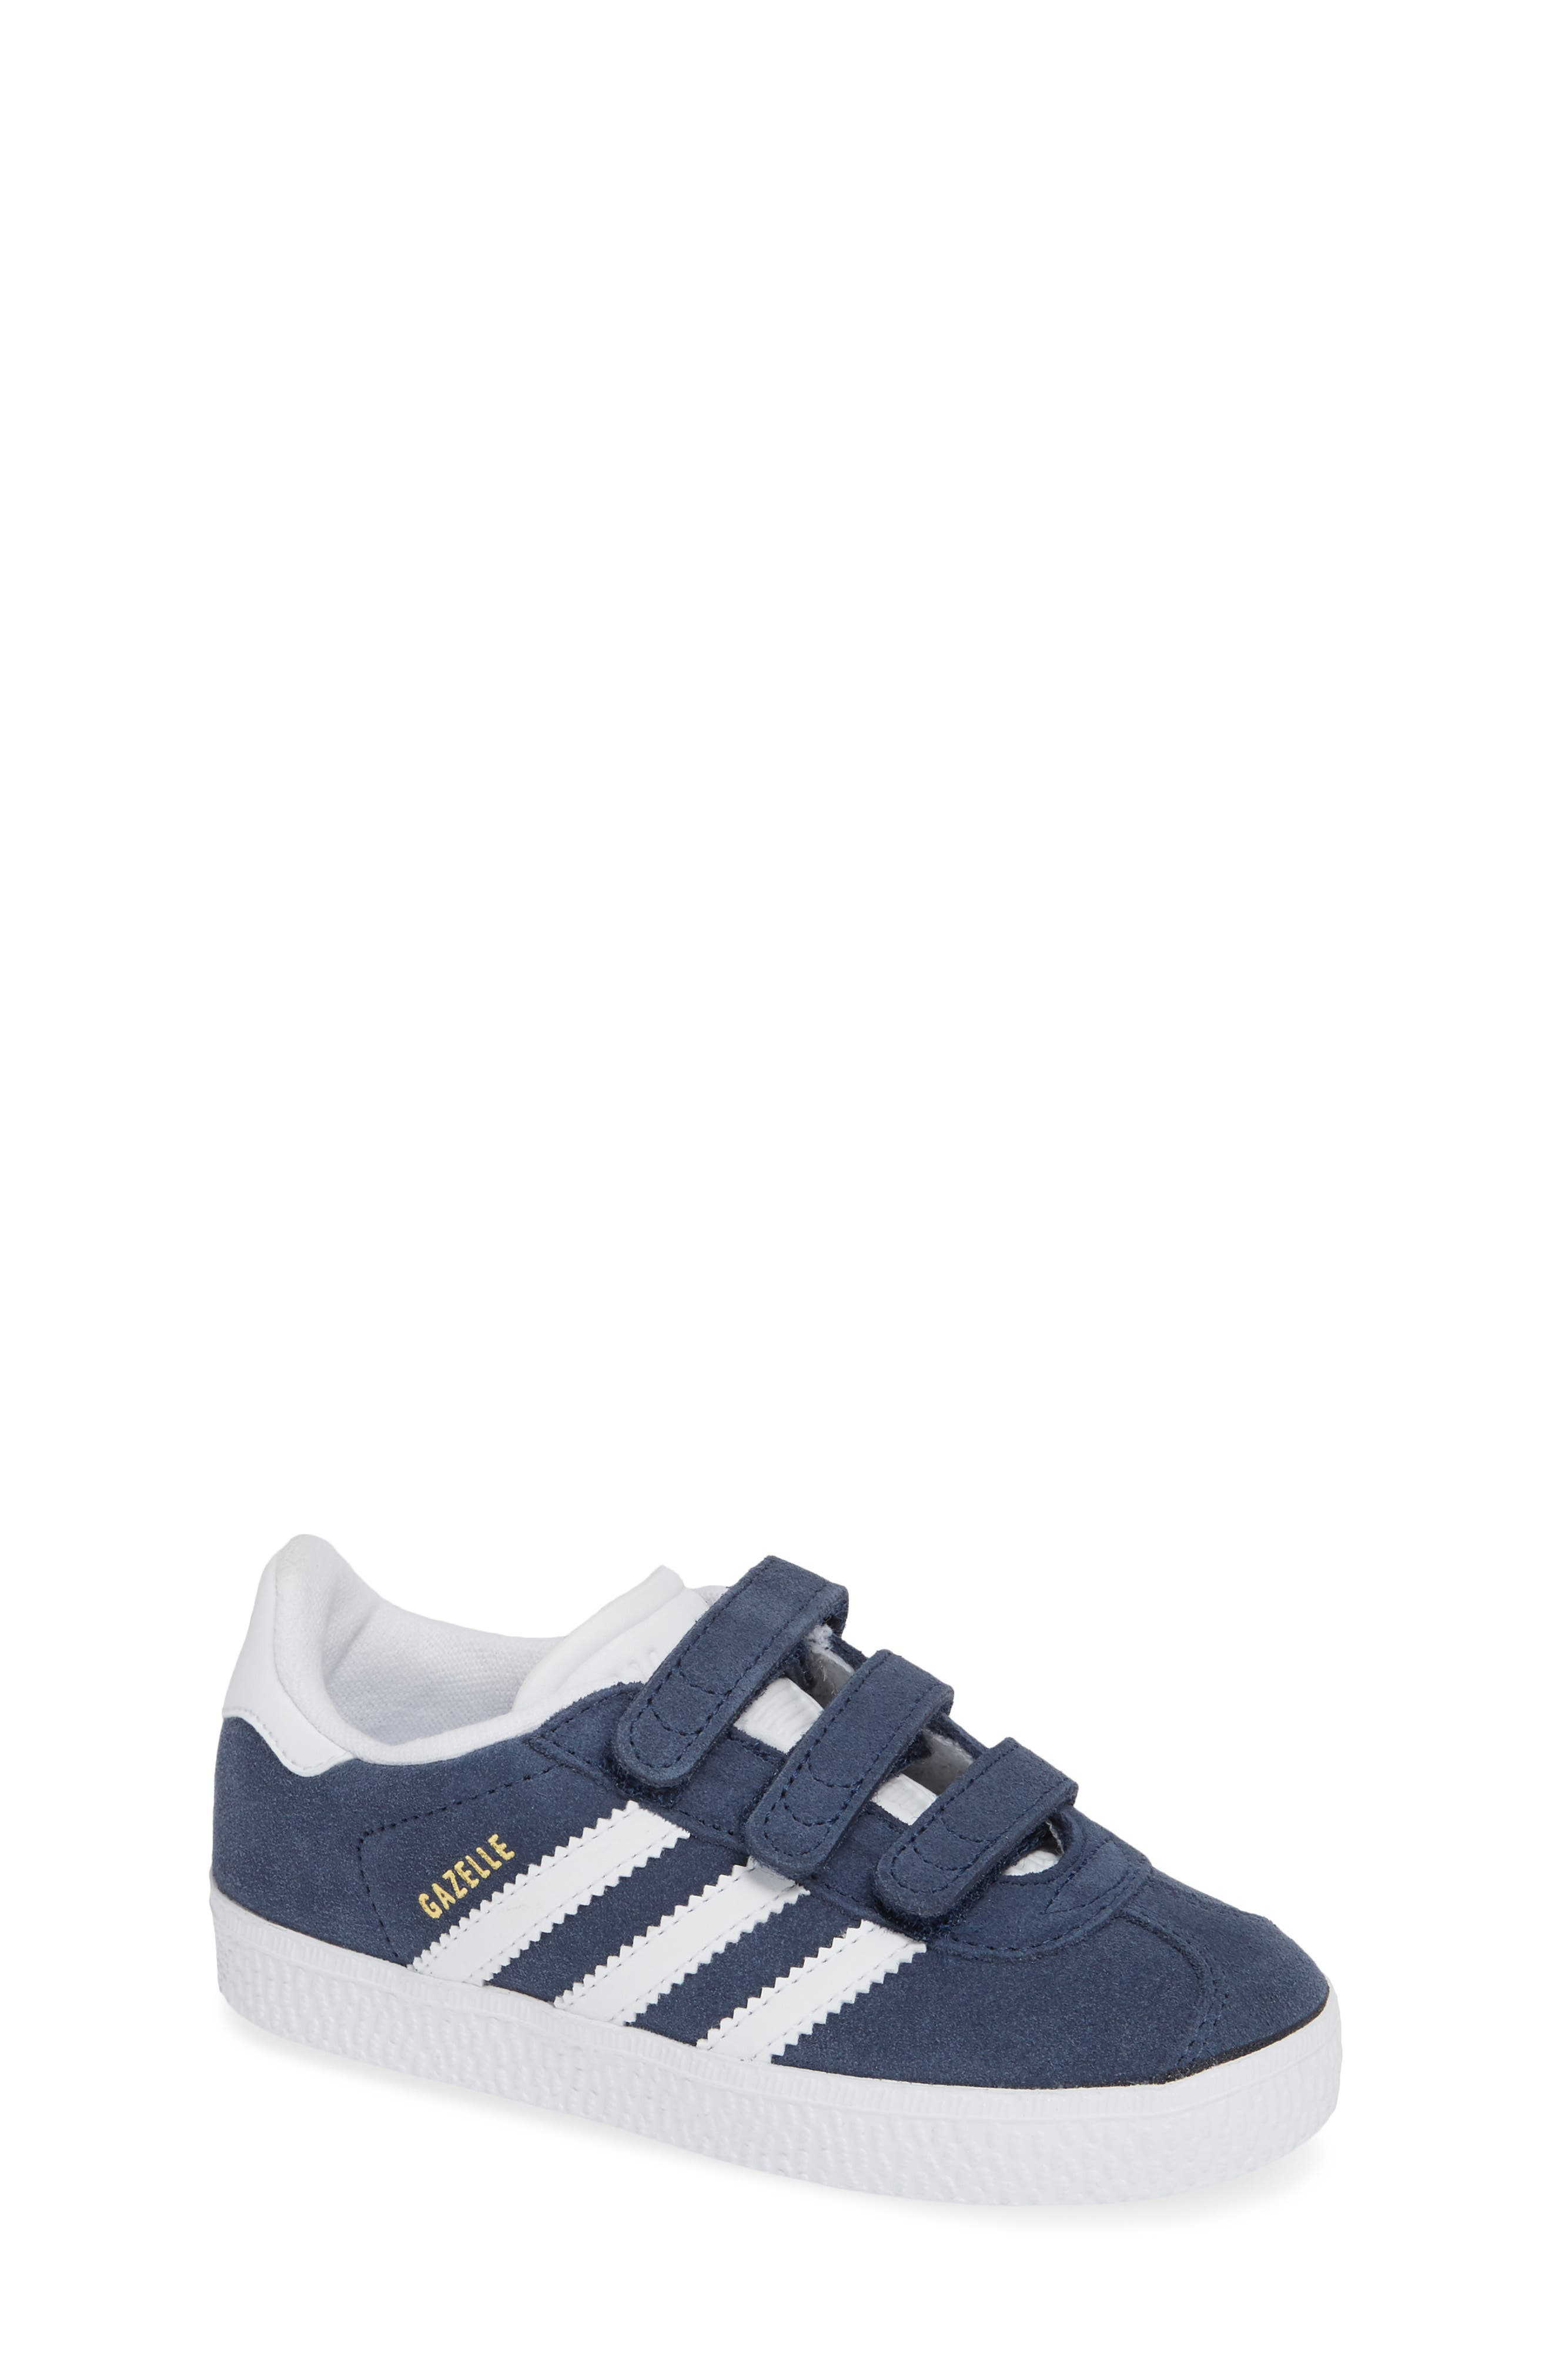 ADIDAS Gazelle Sneaker, Main, color, NAVY/ WHITE